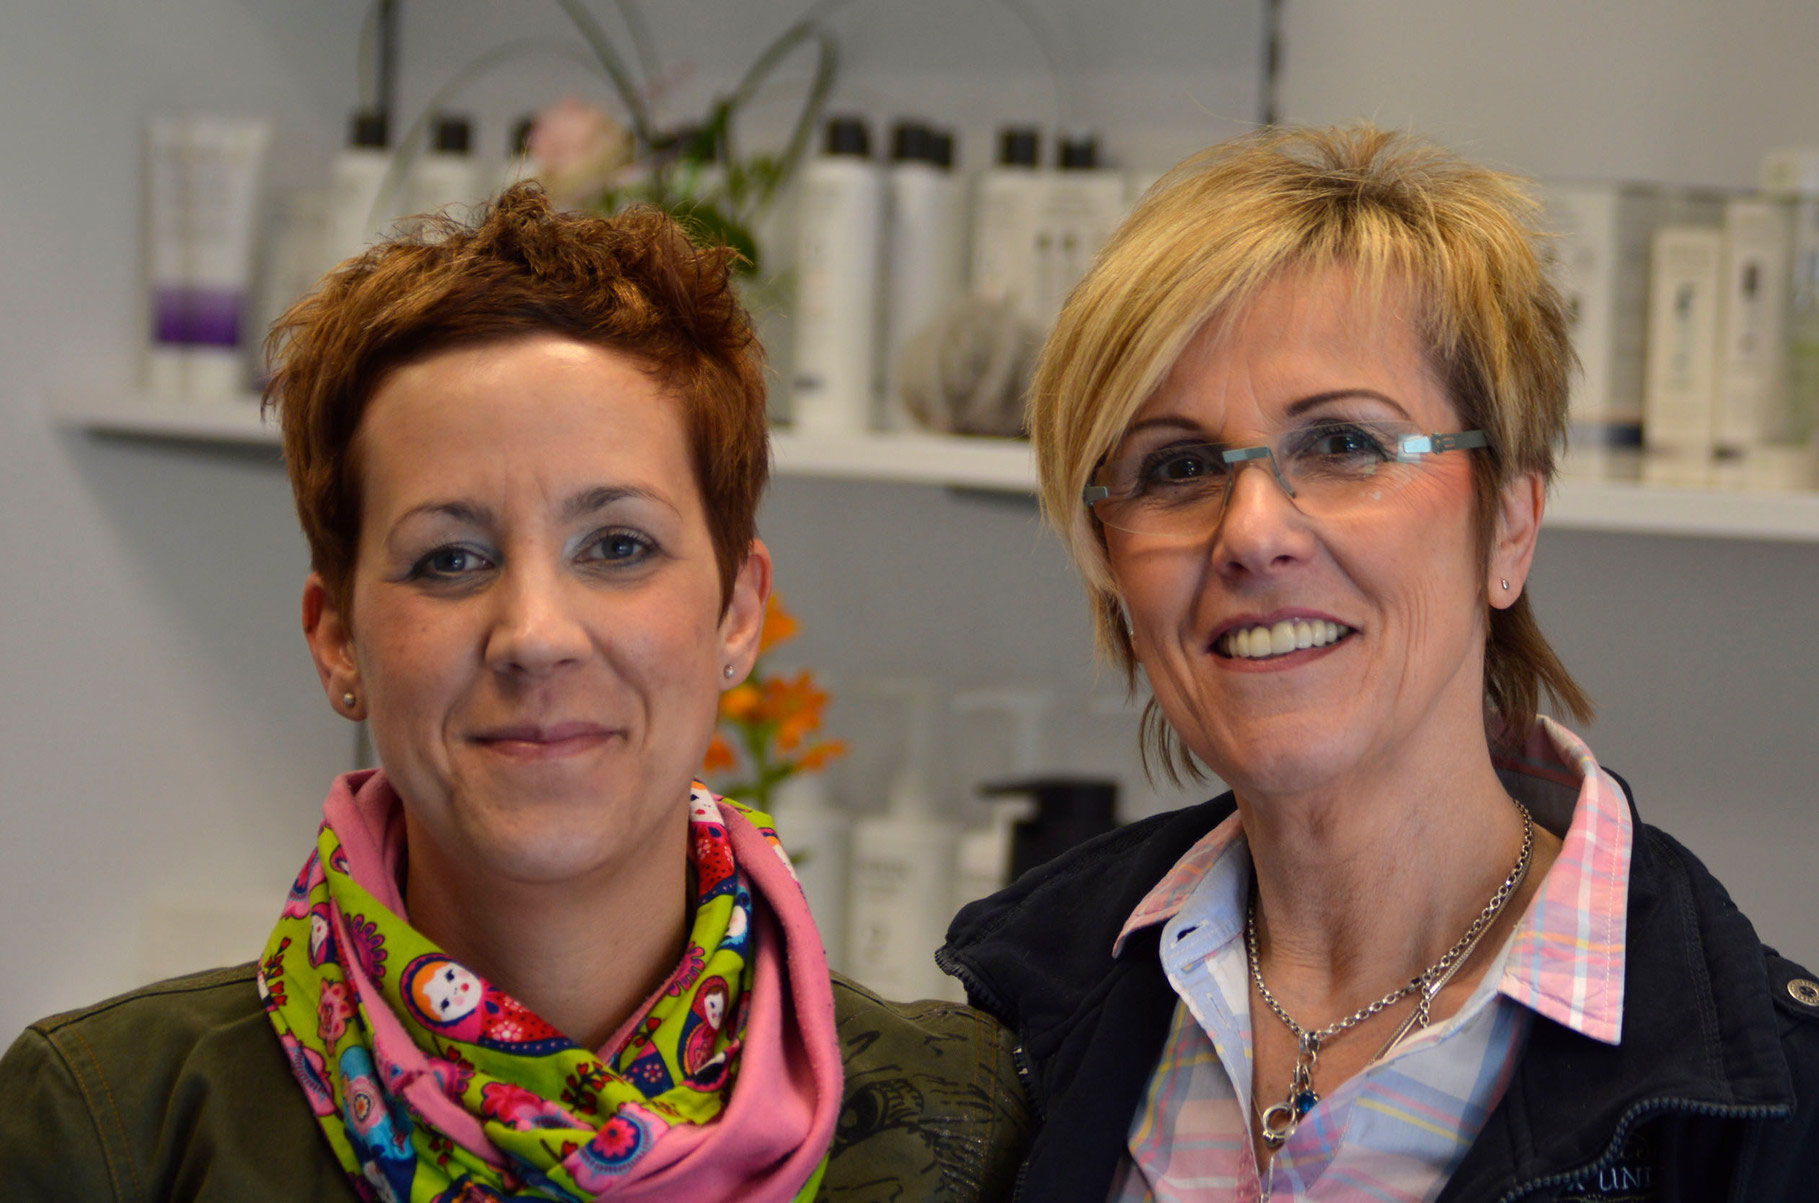 Haarmoden Im Trend Friseur Ingrid Lowin Haarmoden Im Trend